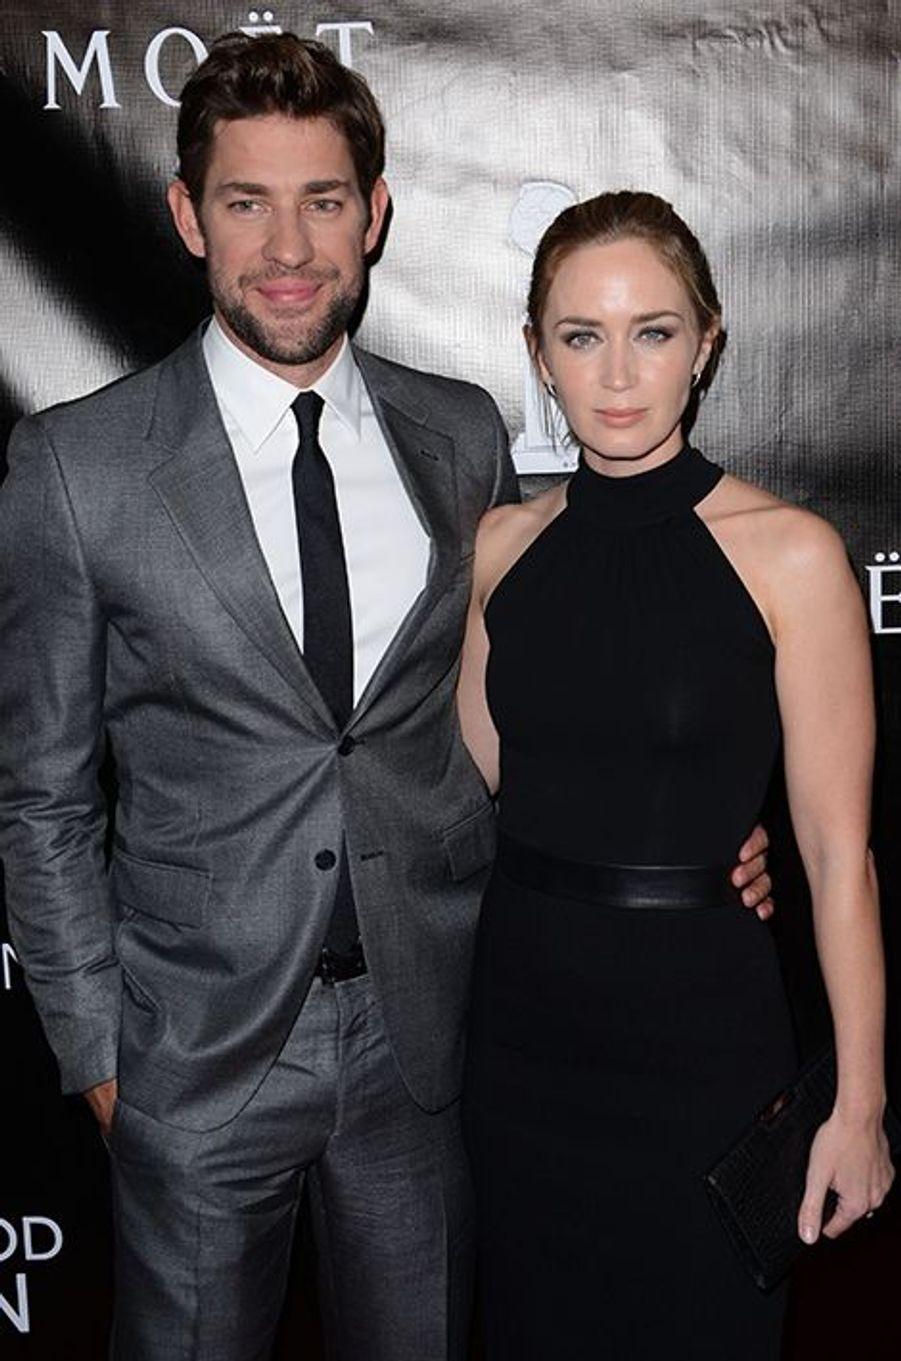 John Krasinski et Emily Blunt à Los Angeles le 13 août 2015